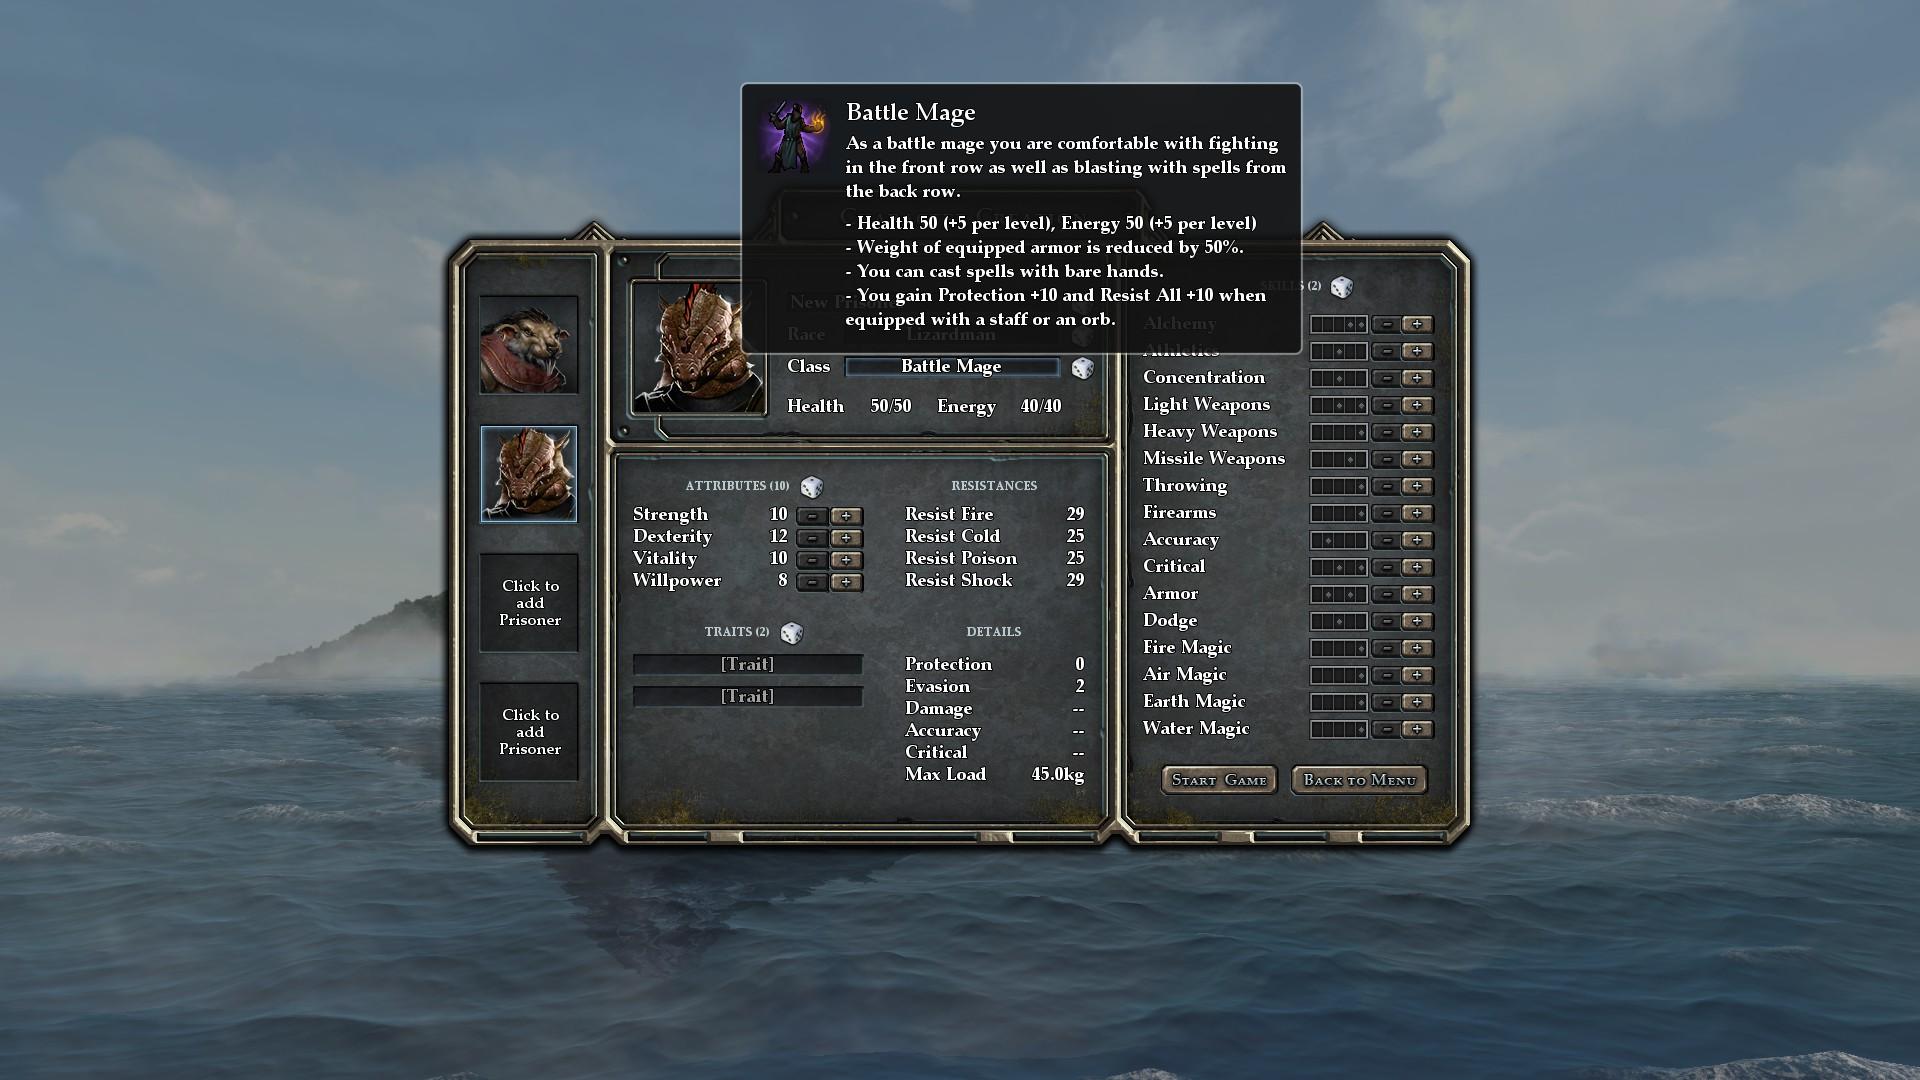 legend of grimrock 2 character creation